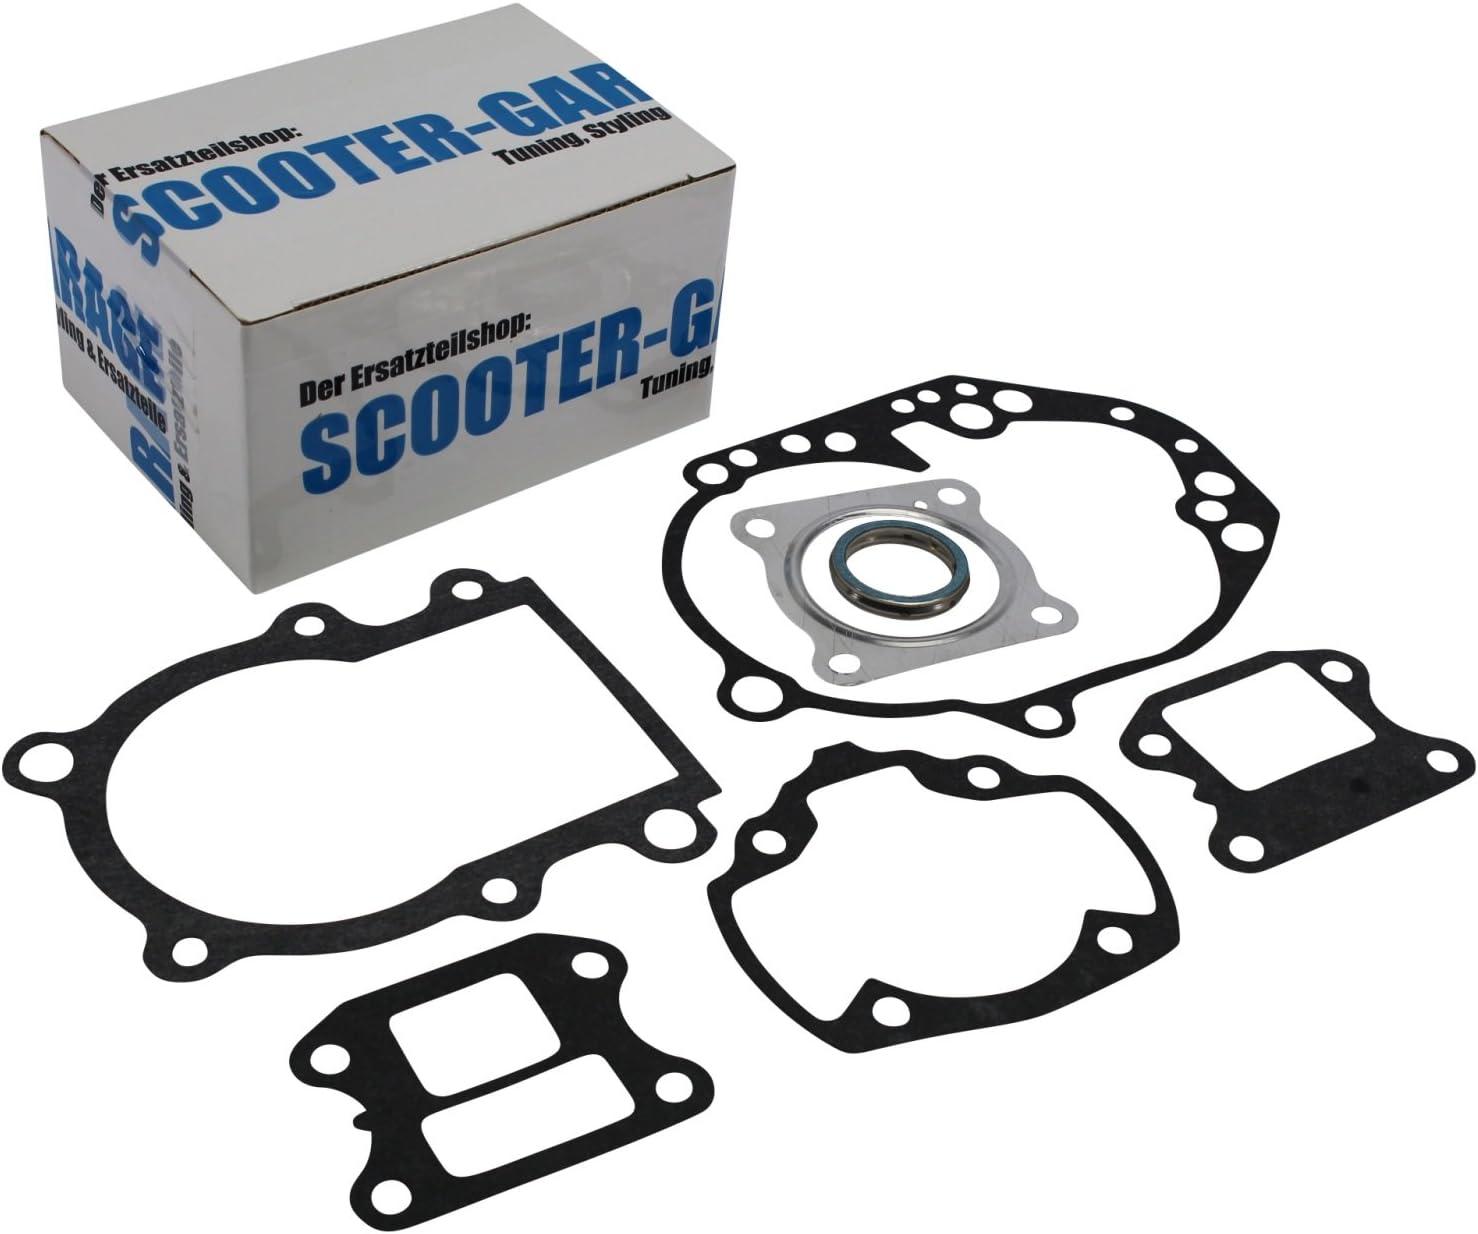 Motordichtsatz 50ccm Für Peugeot Speedfight 1 50 Ac Speedfight 2 50 Ac Buxy 50 Vivacity 50 2t Auto